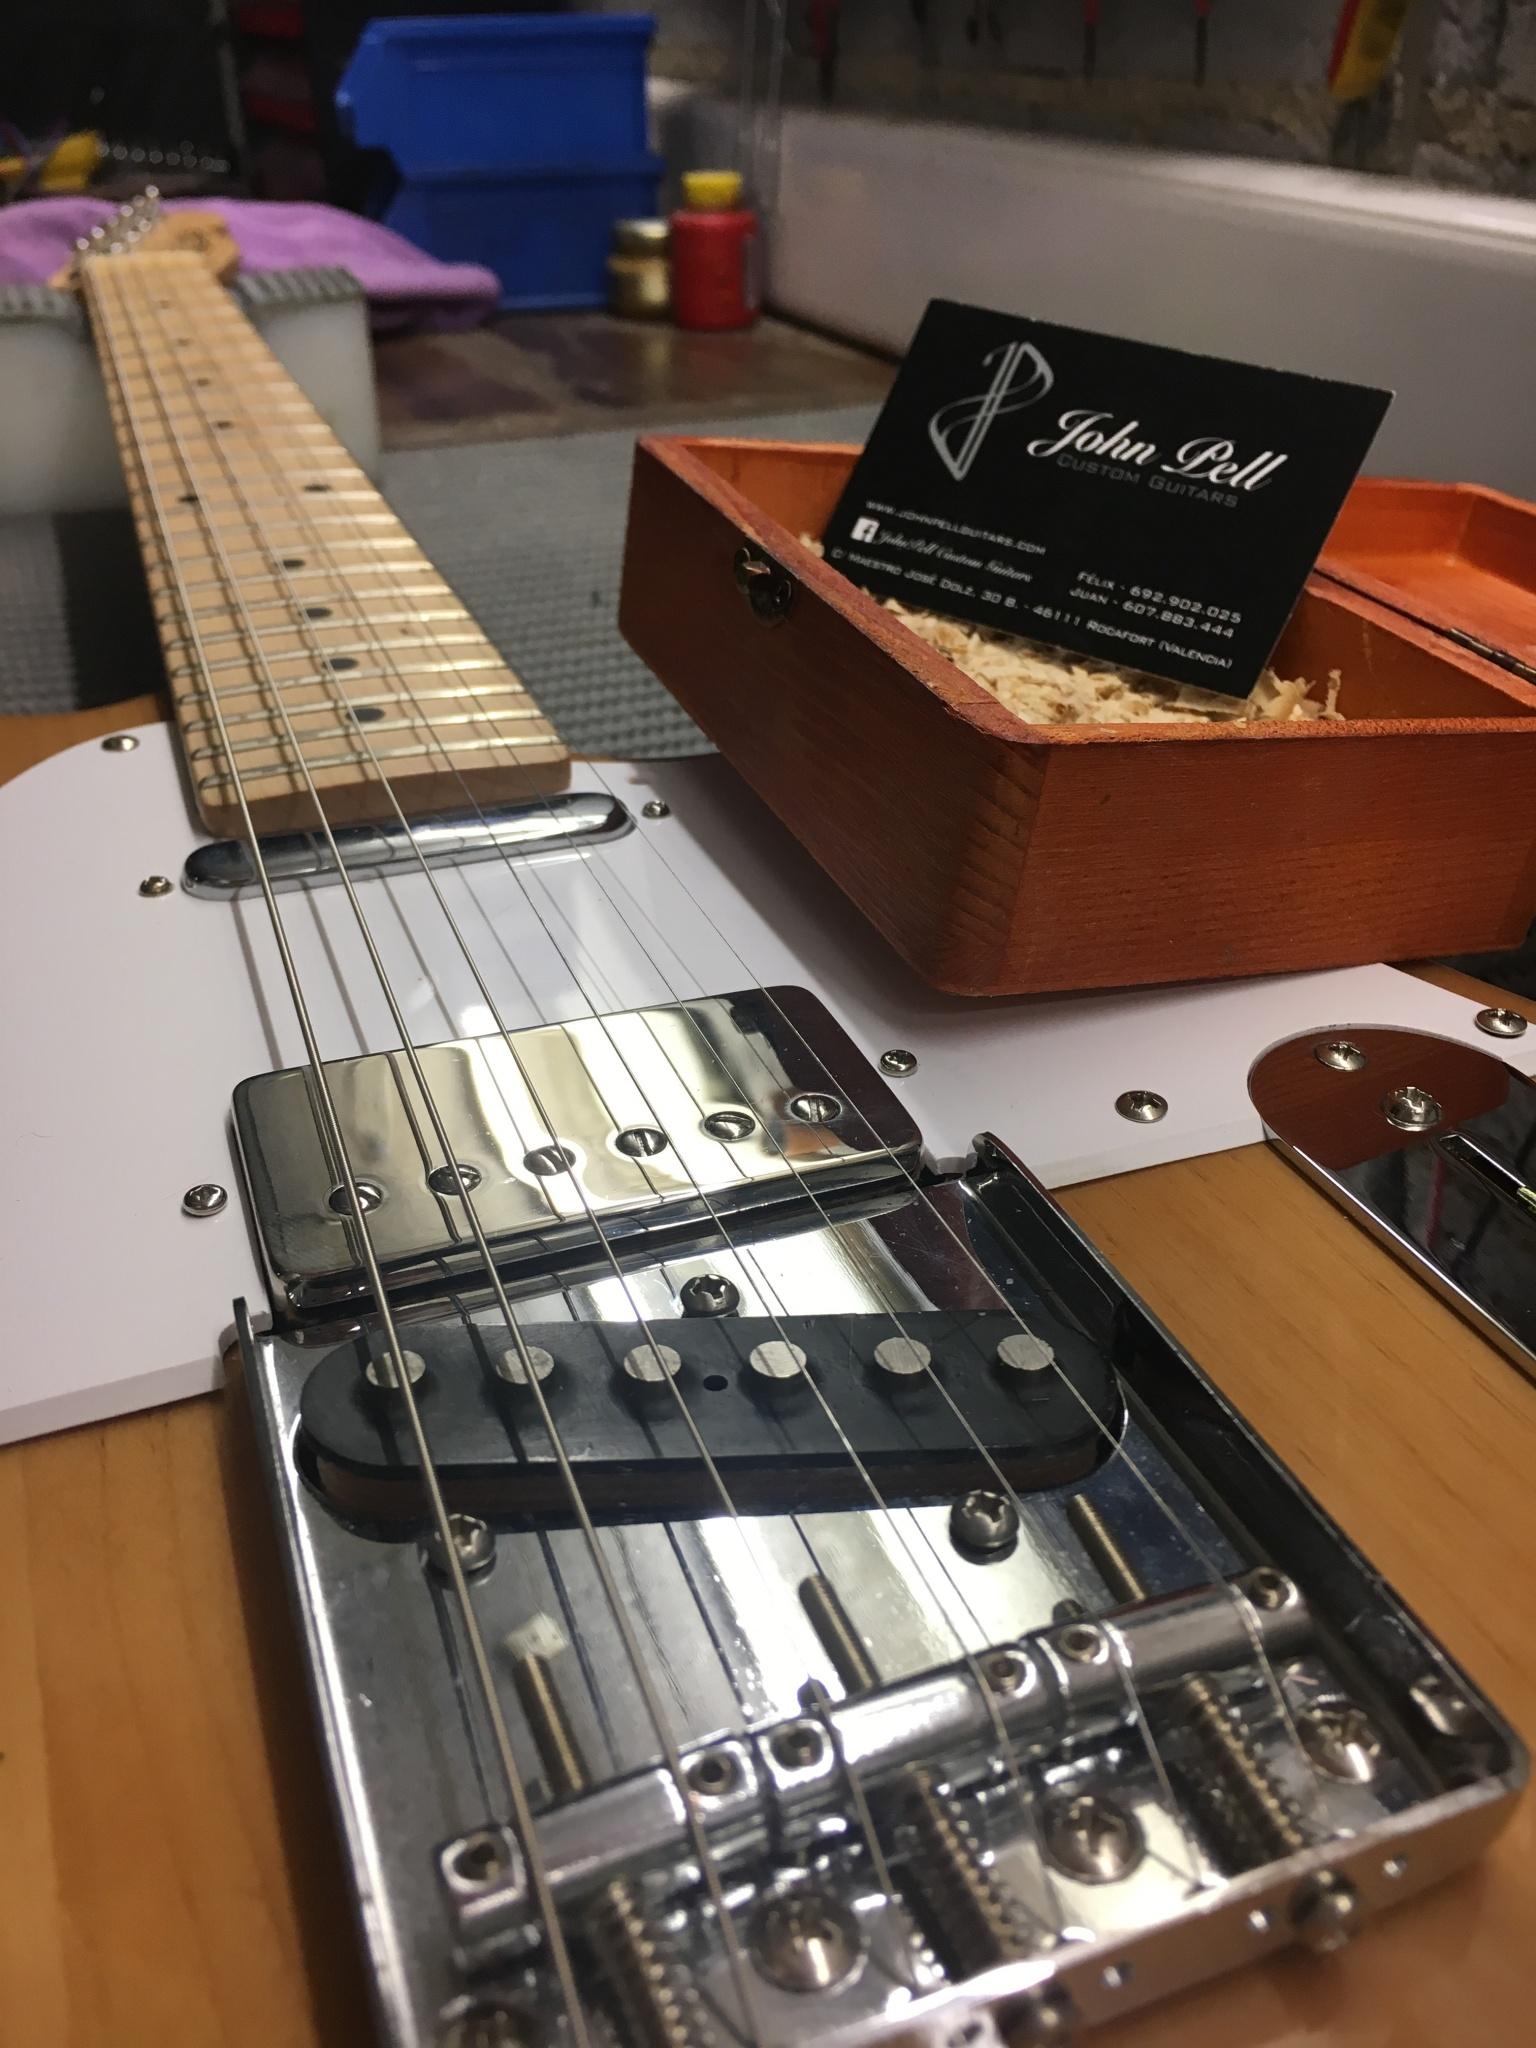 IMG 4127 e1486390927924 - Mejora electronica guitarra LD ,pastillas JOHN PELL